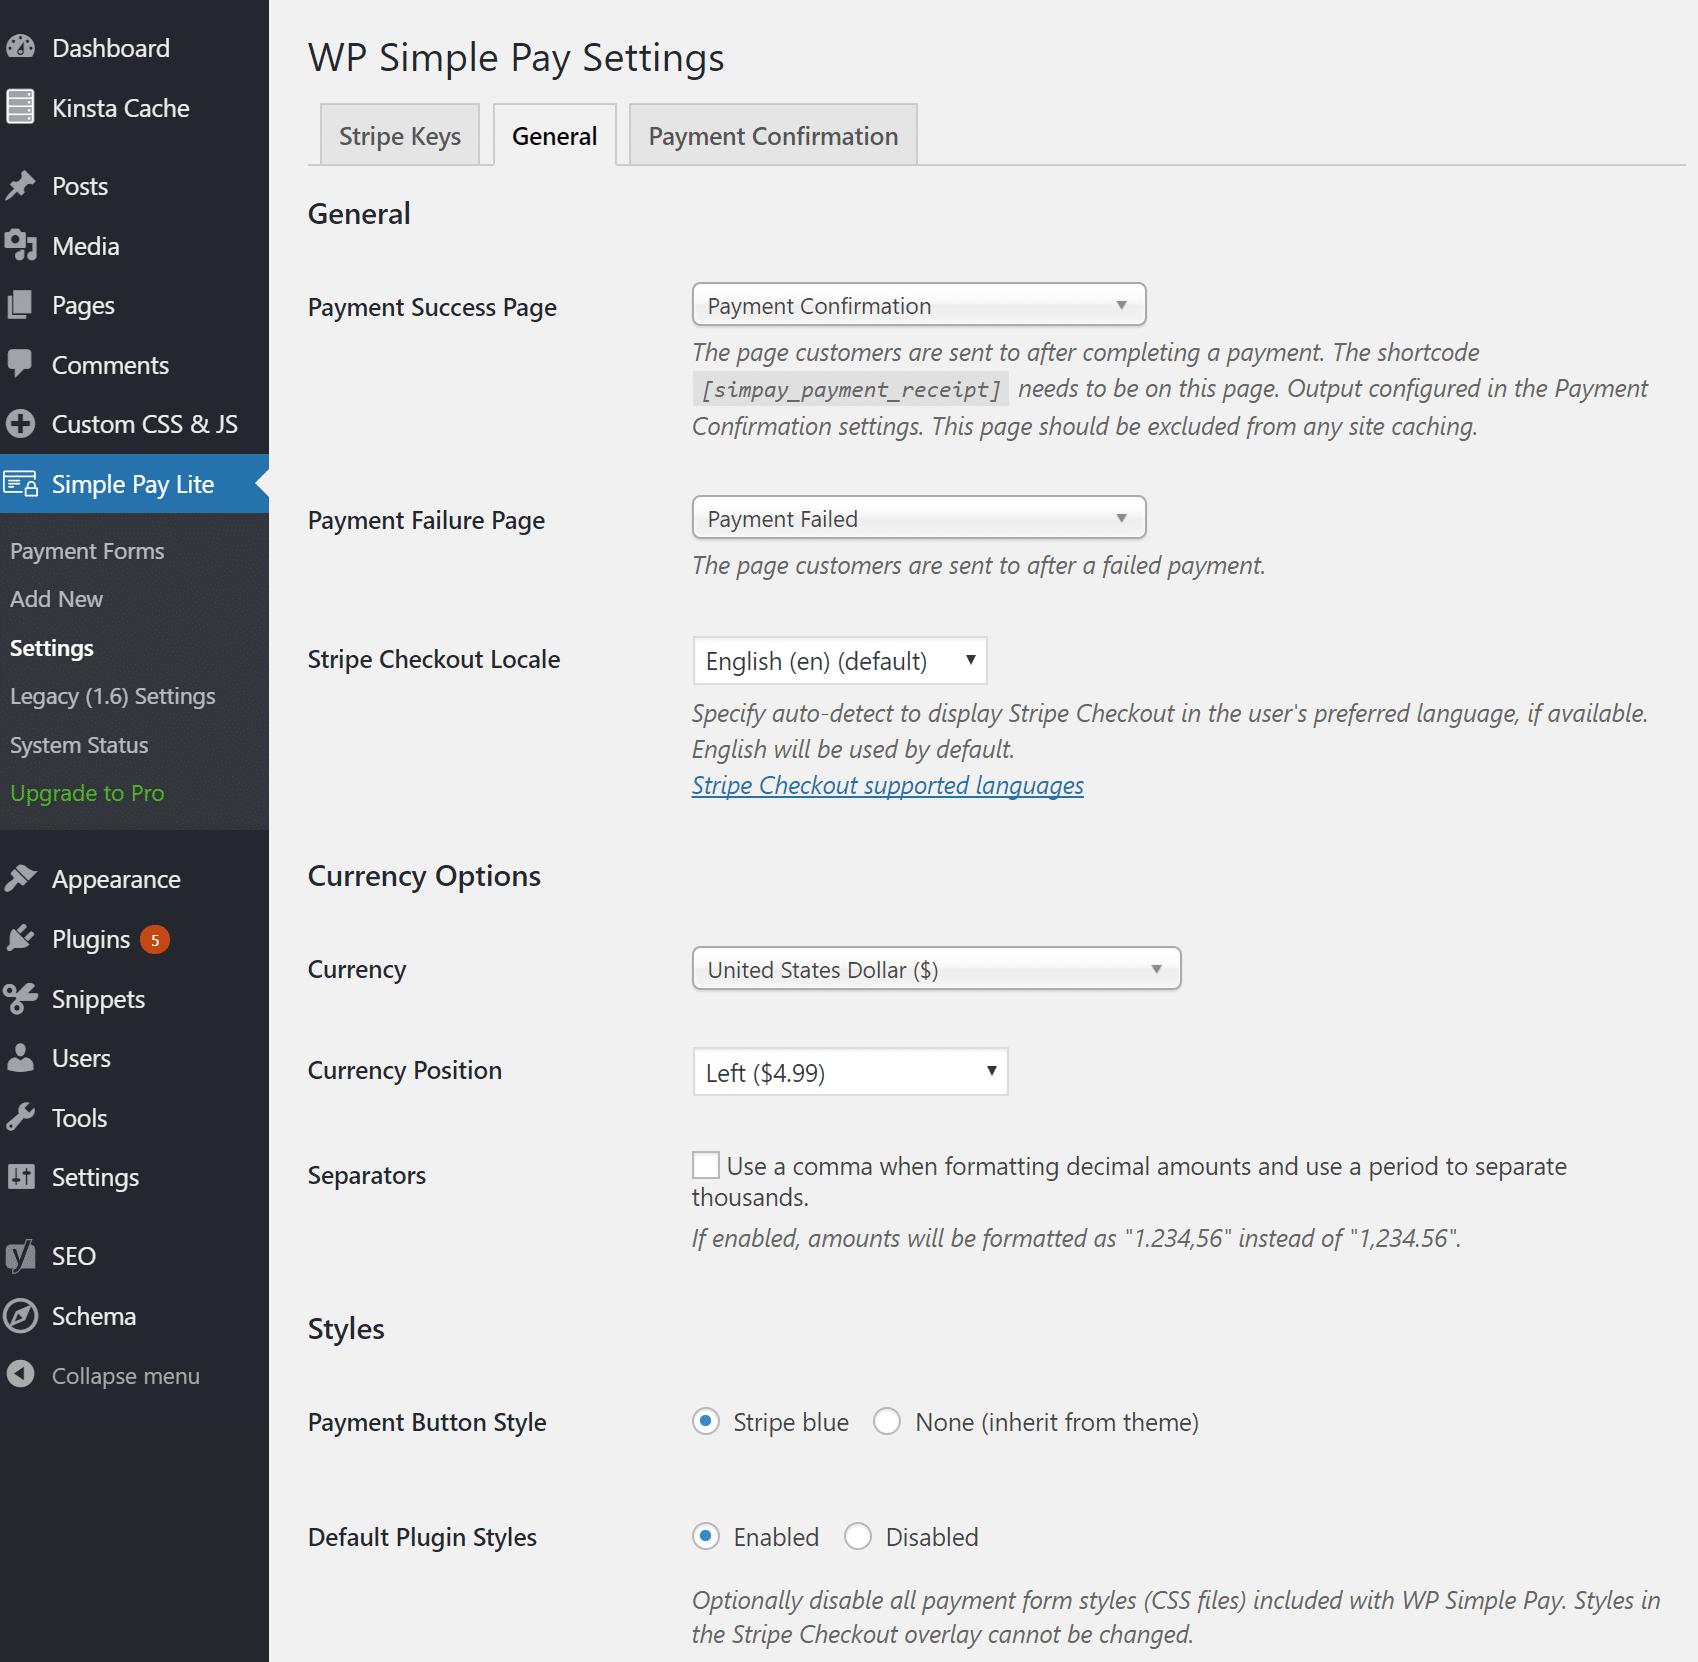 Configurações de WP Simple Pay